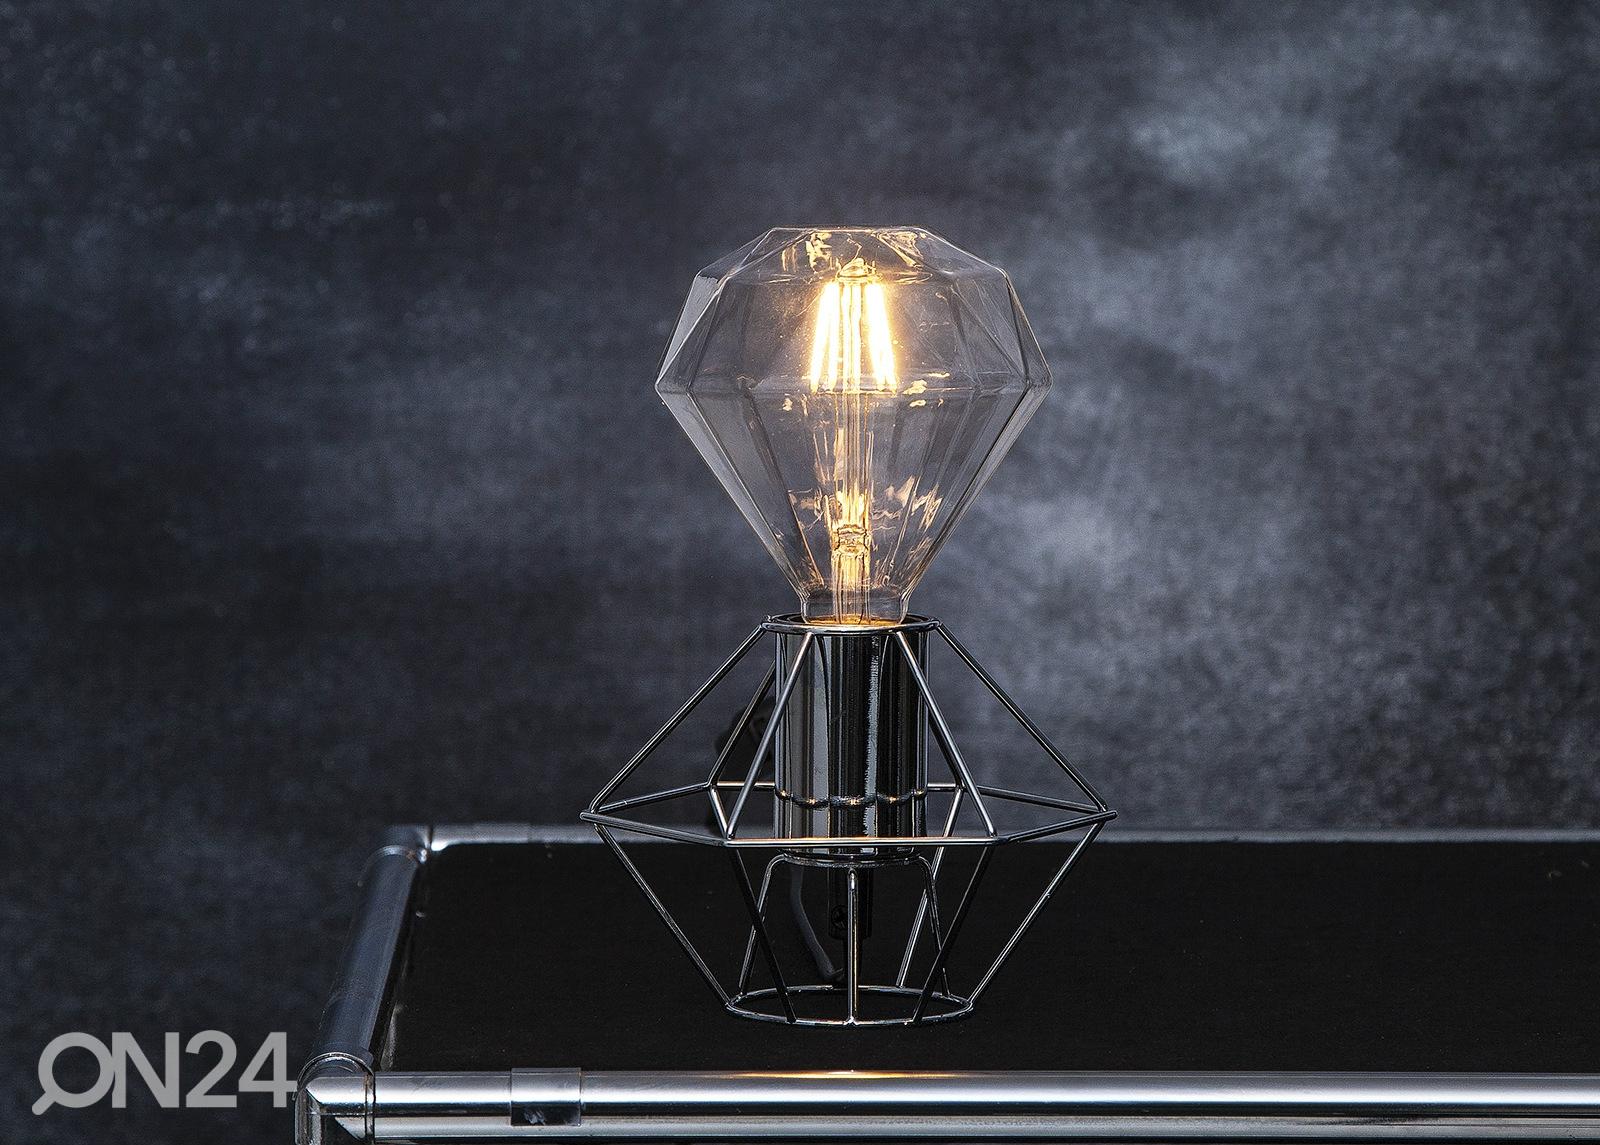 0b8d4505e0b Dekoratiivne LED pirn E27 1,65 W AA-152413 - ON24 Sisustuskaubamaja